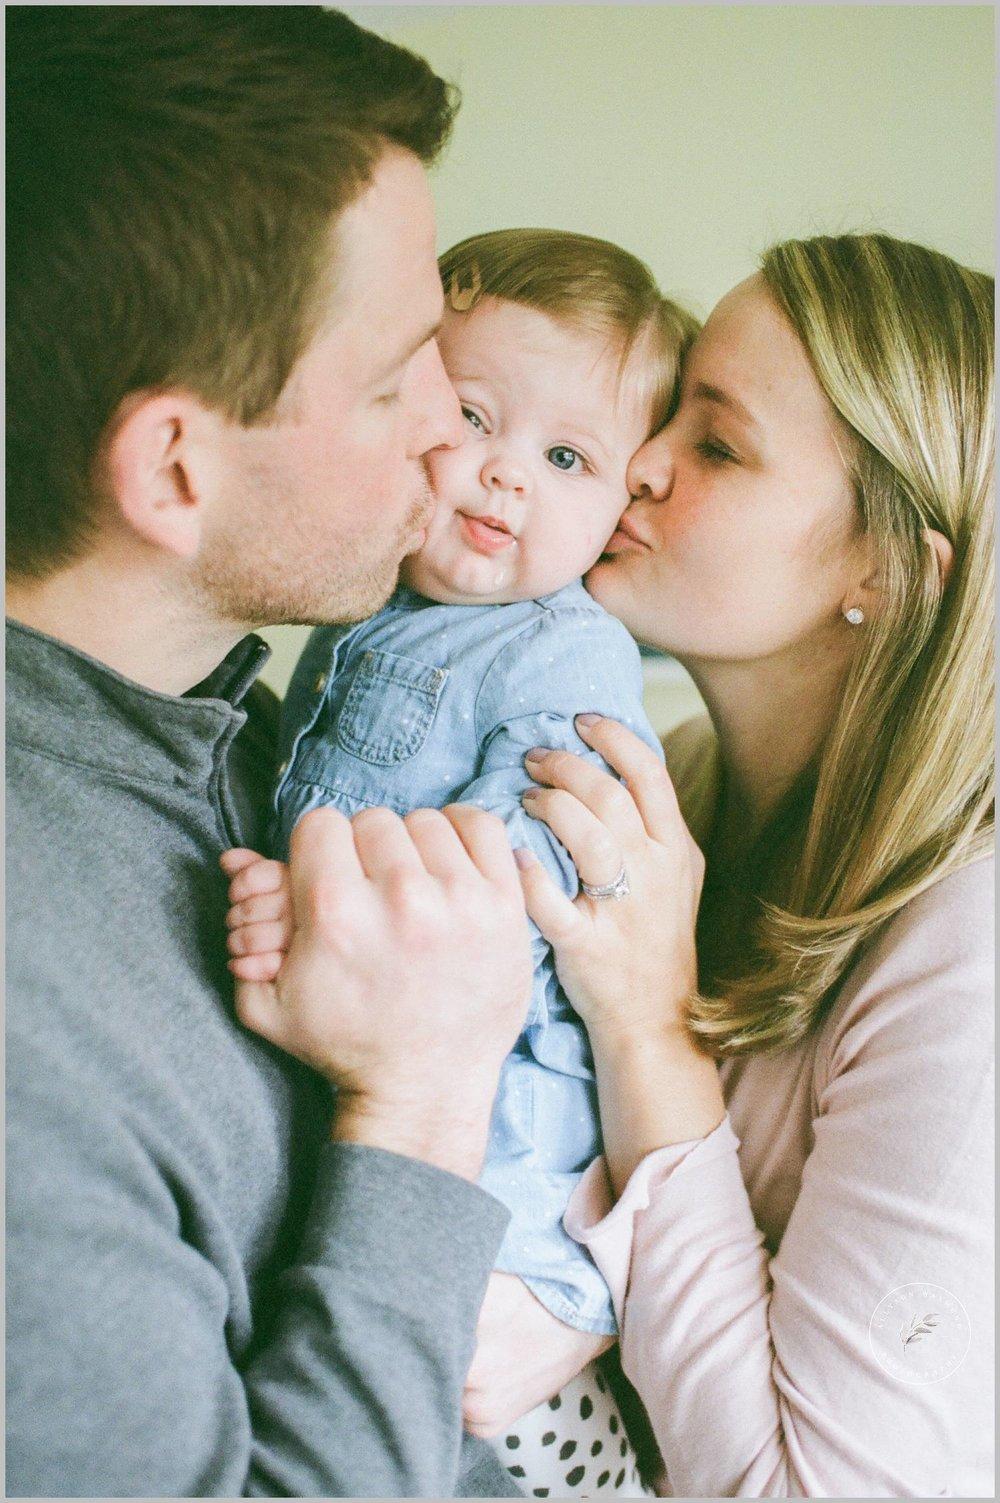 minnetonka-baby-milestone-lifestyle-film-photographer_0055.jpg